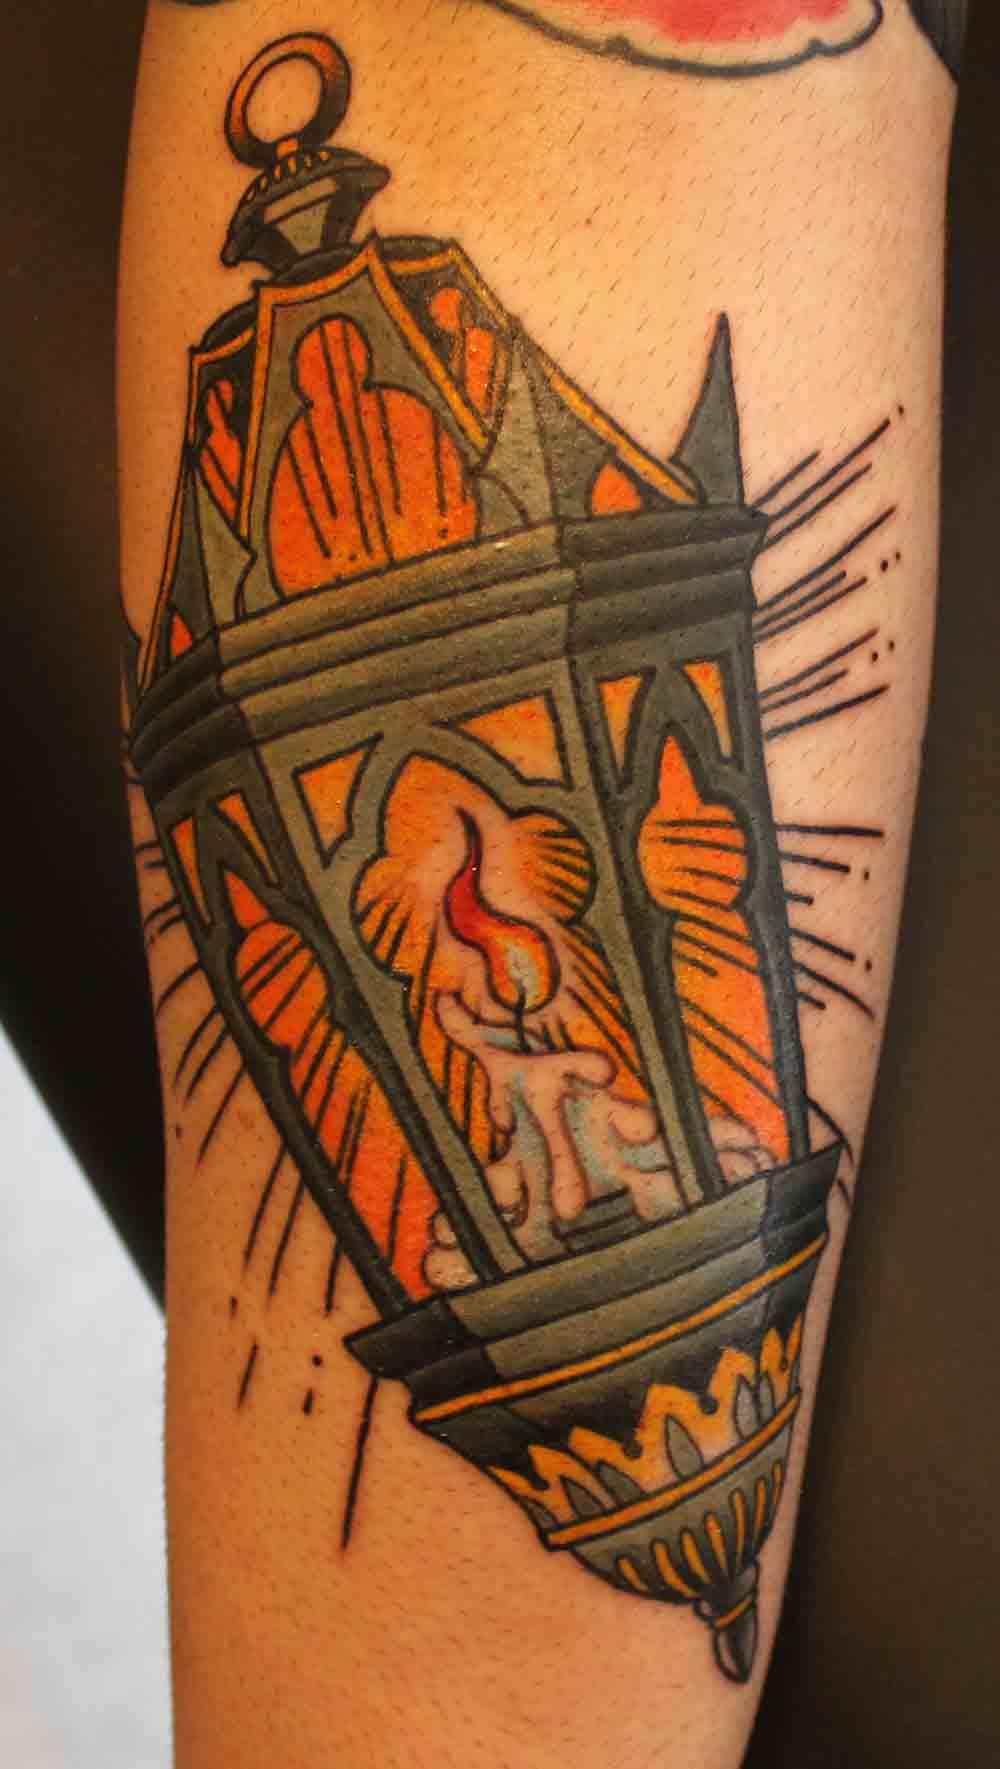 Tattoo & Body Piercing Albums - Syracuse, NY - Scarab Body Arts